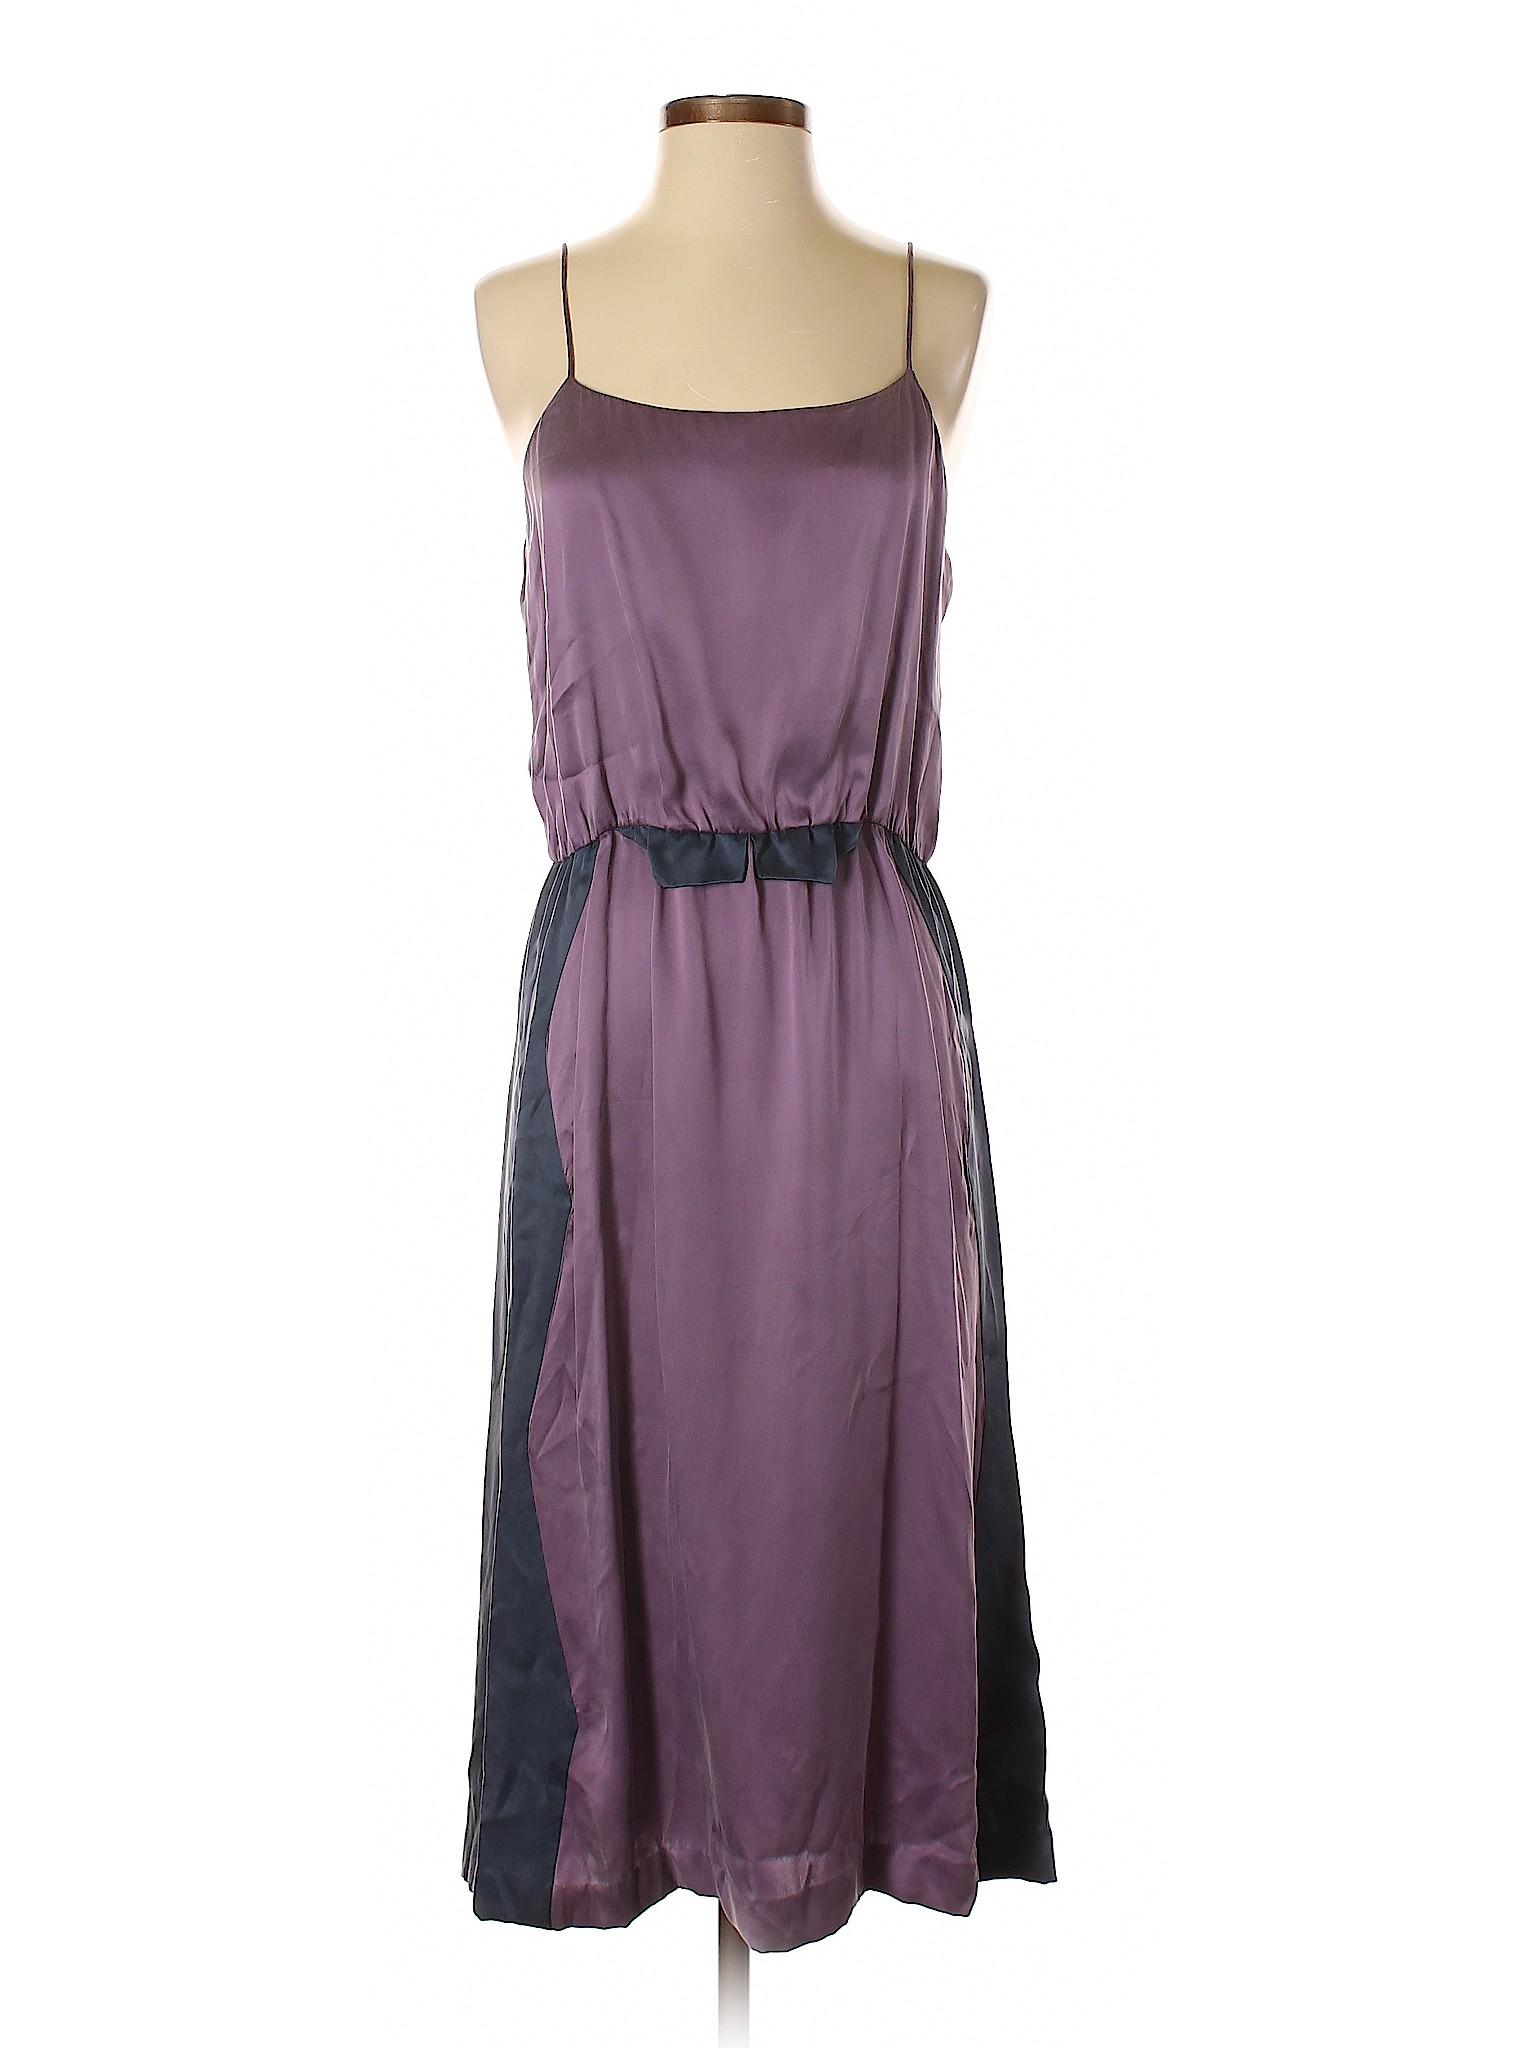 Casual Selling Dress Rowley Casual Selling Cynthia Dress Rowley Cynthia O1cOqwFHWz